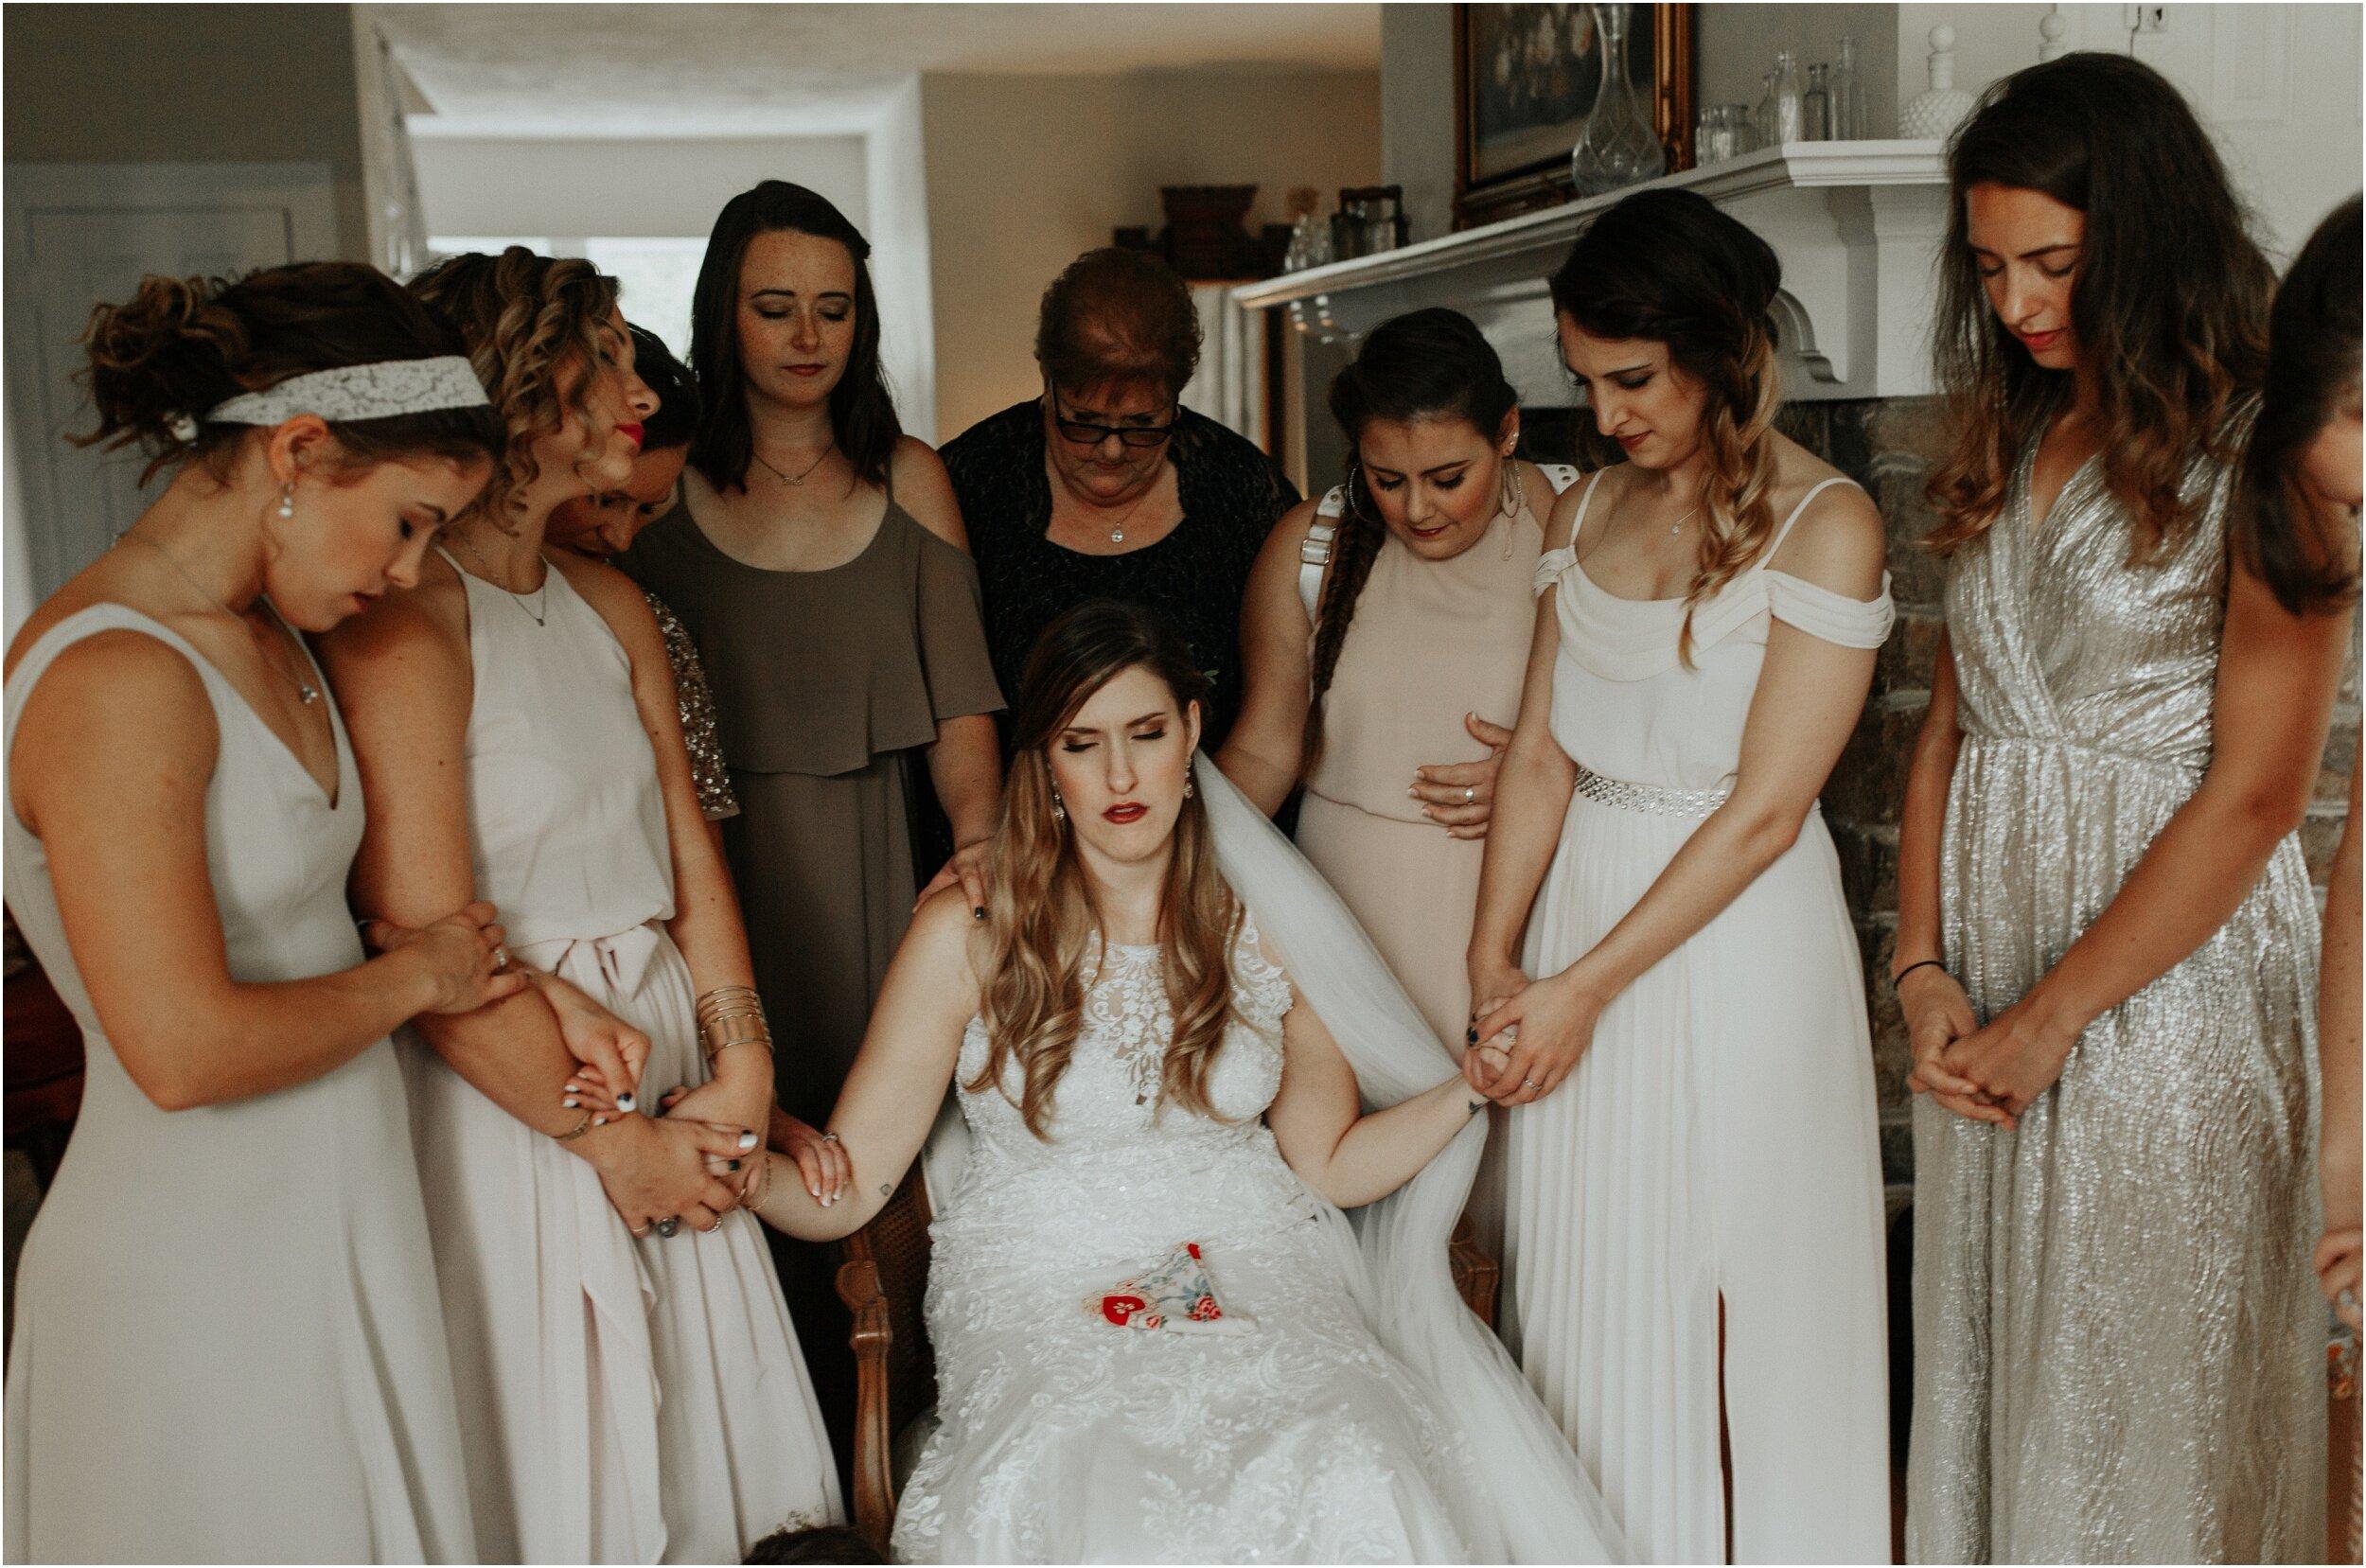 steph-and-jordan-cox-our-wedding-historic-shady-lane-compass-wedding-collective-hazel-lining-photography-destination-elopement-wedding-engagement-photography_0023.jpg